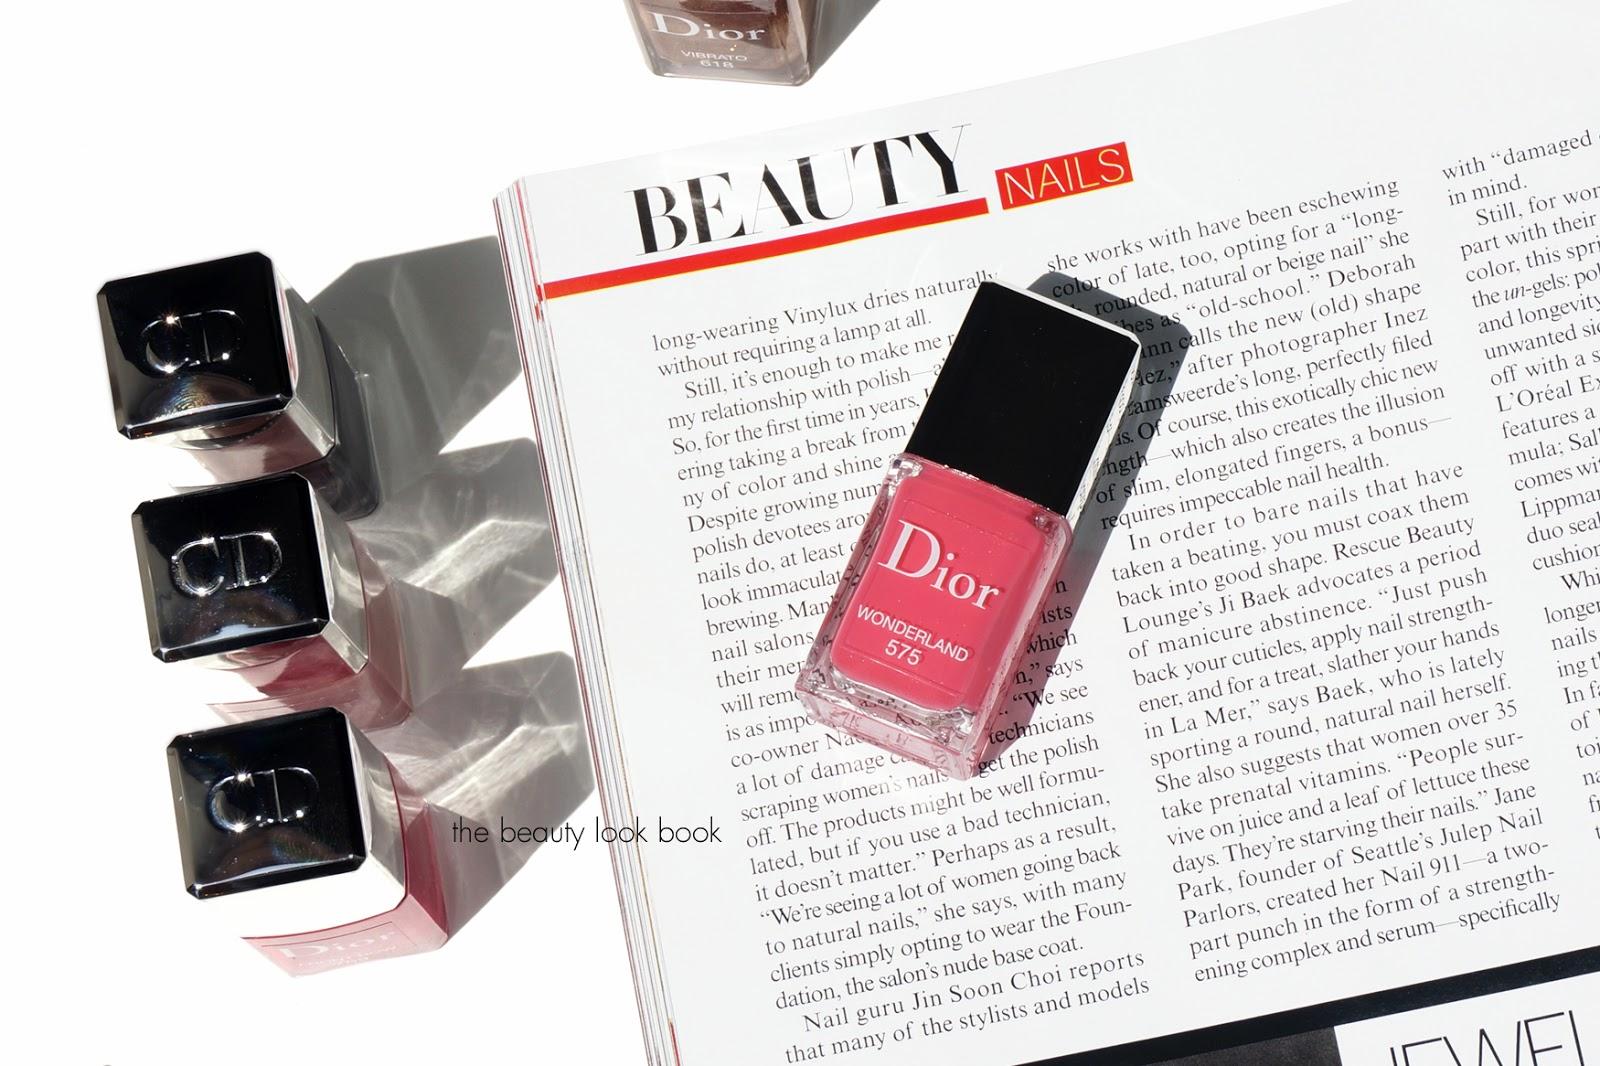 Dior Wonderland #575 Vernis Gel Shine Nail Lacquer